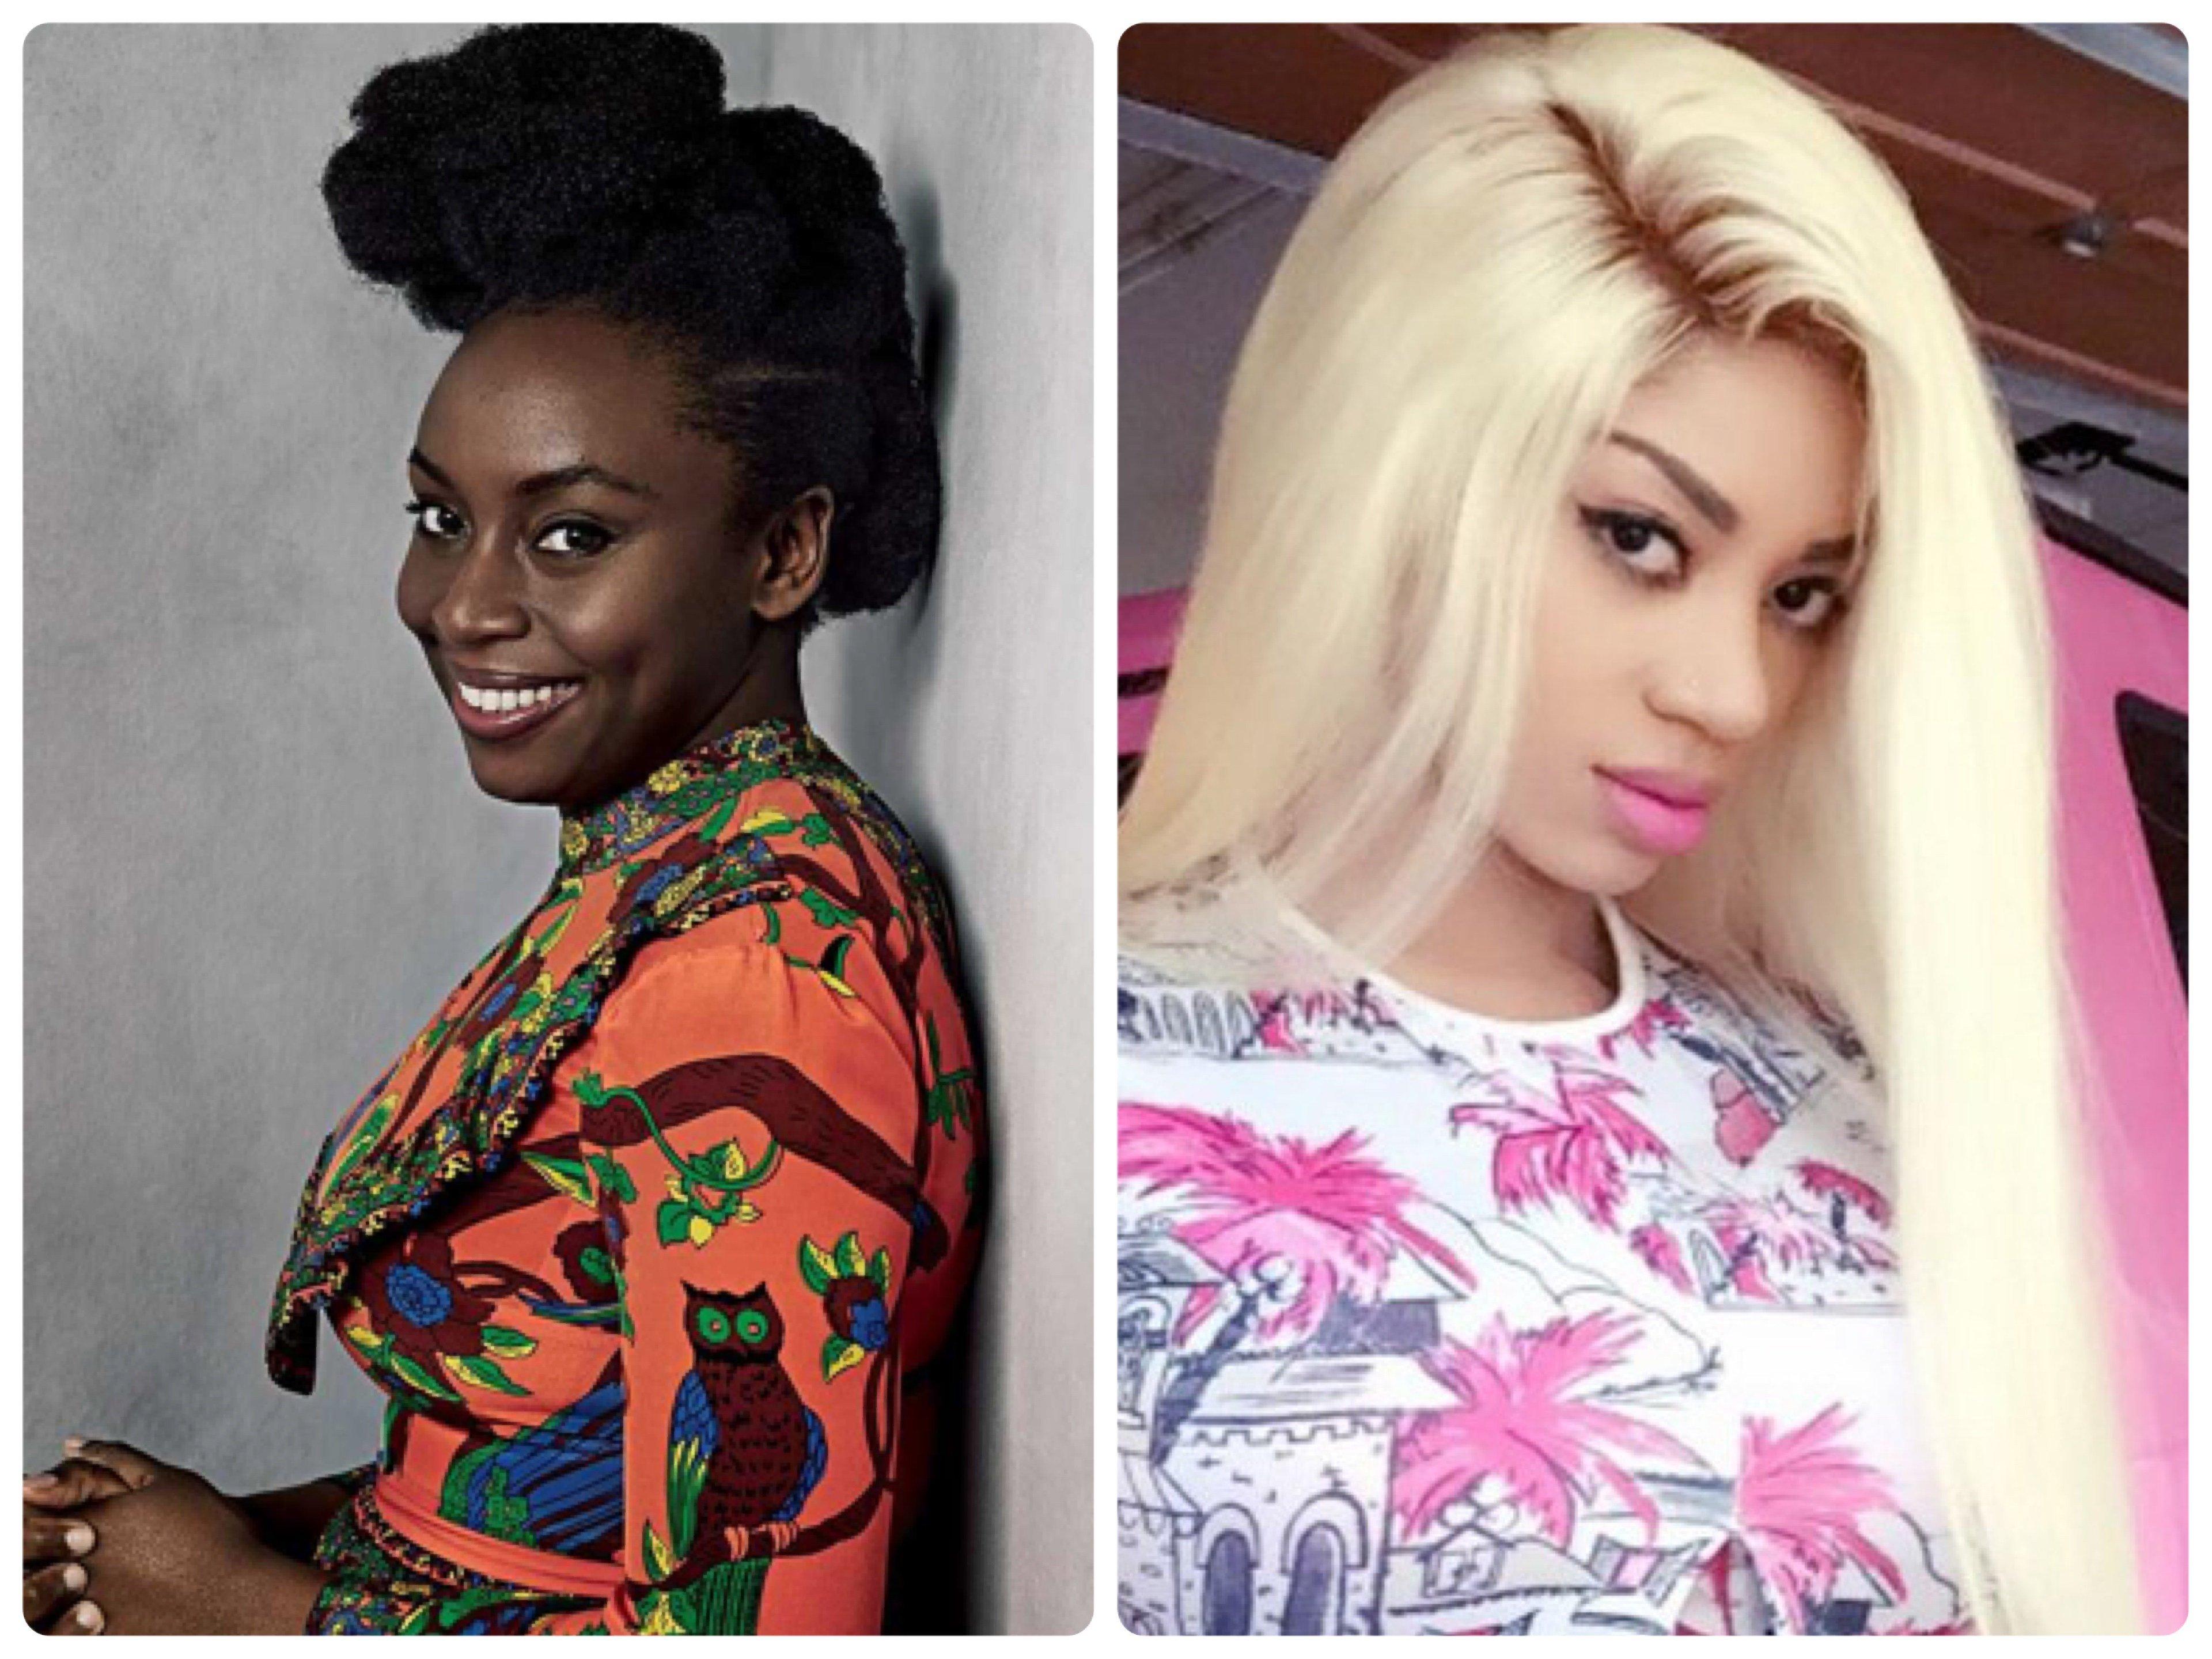 Chimamanda Adichie thinks like a backward clock - Dencia